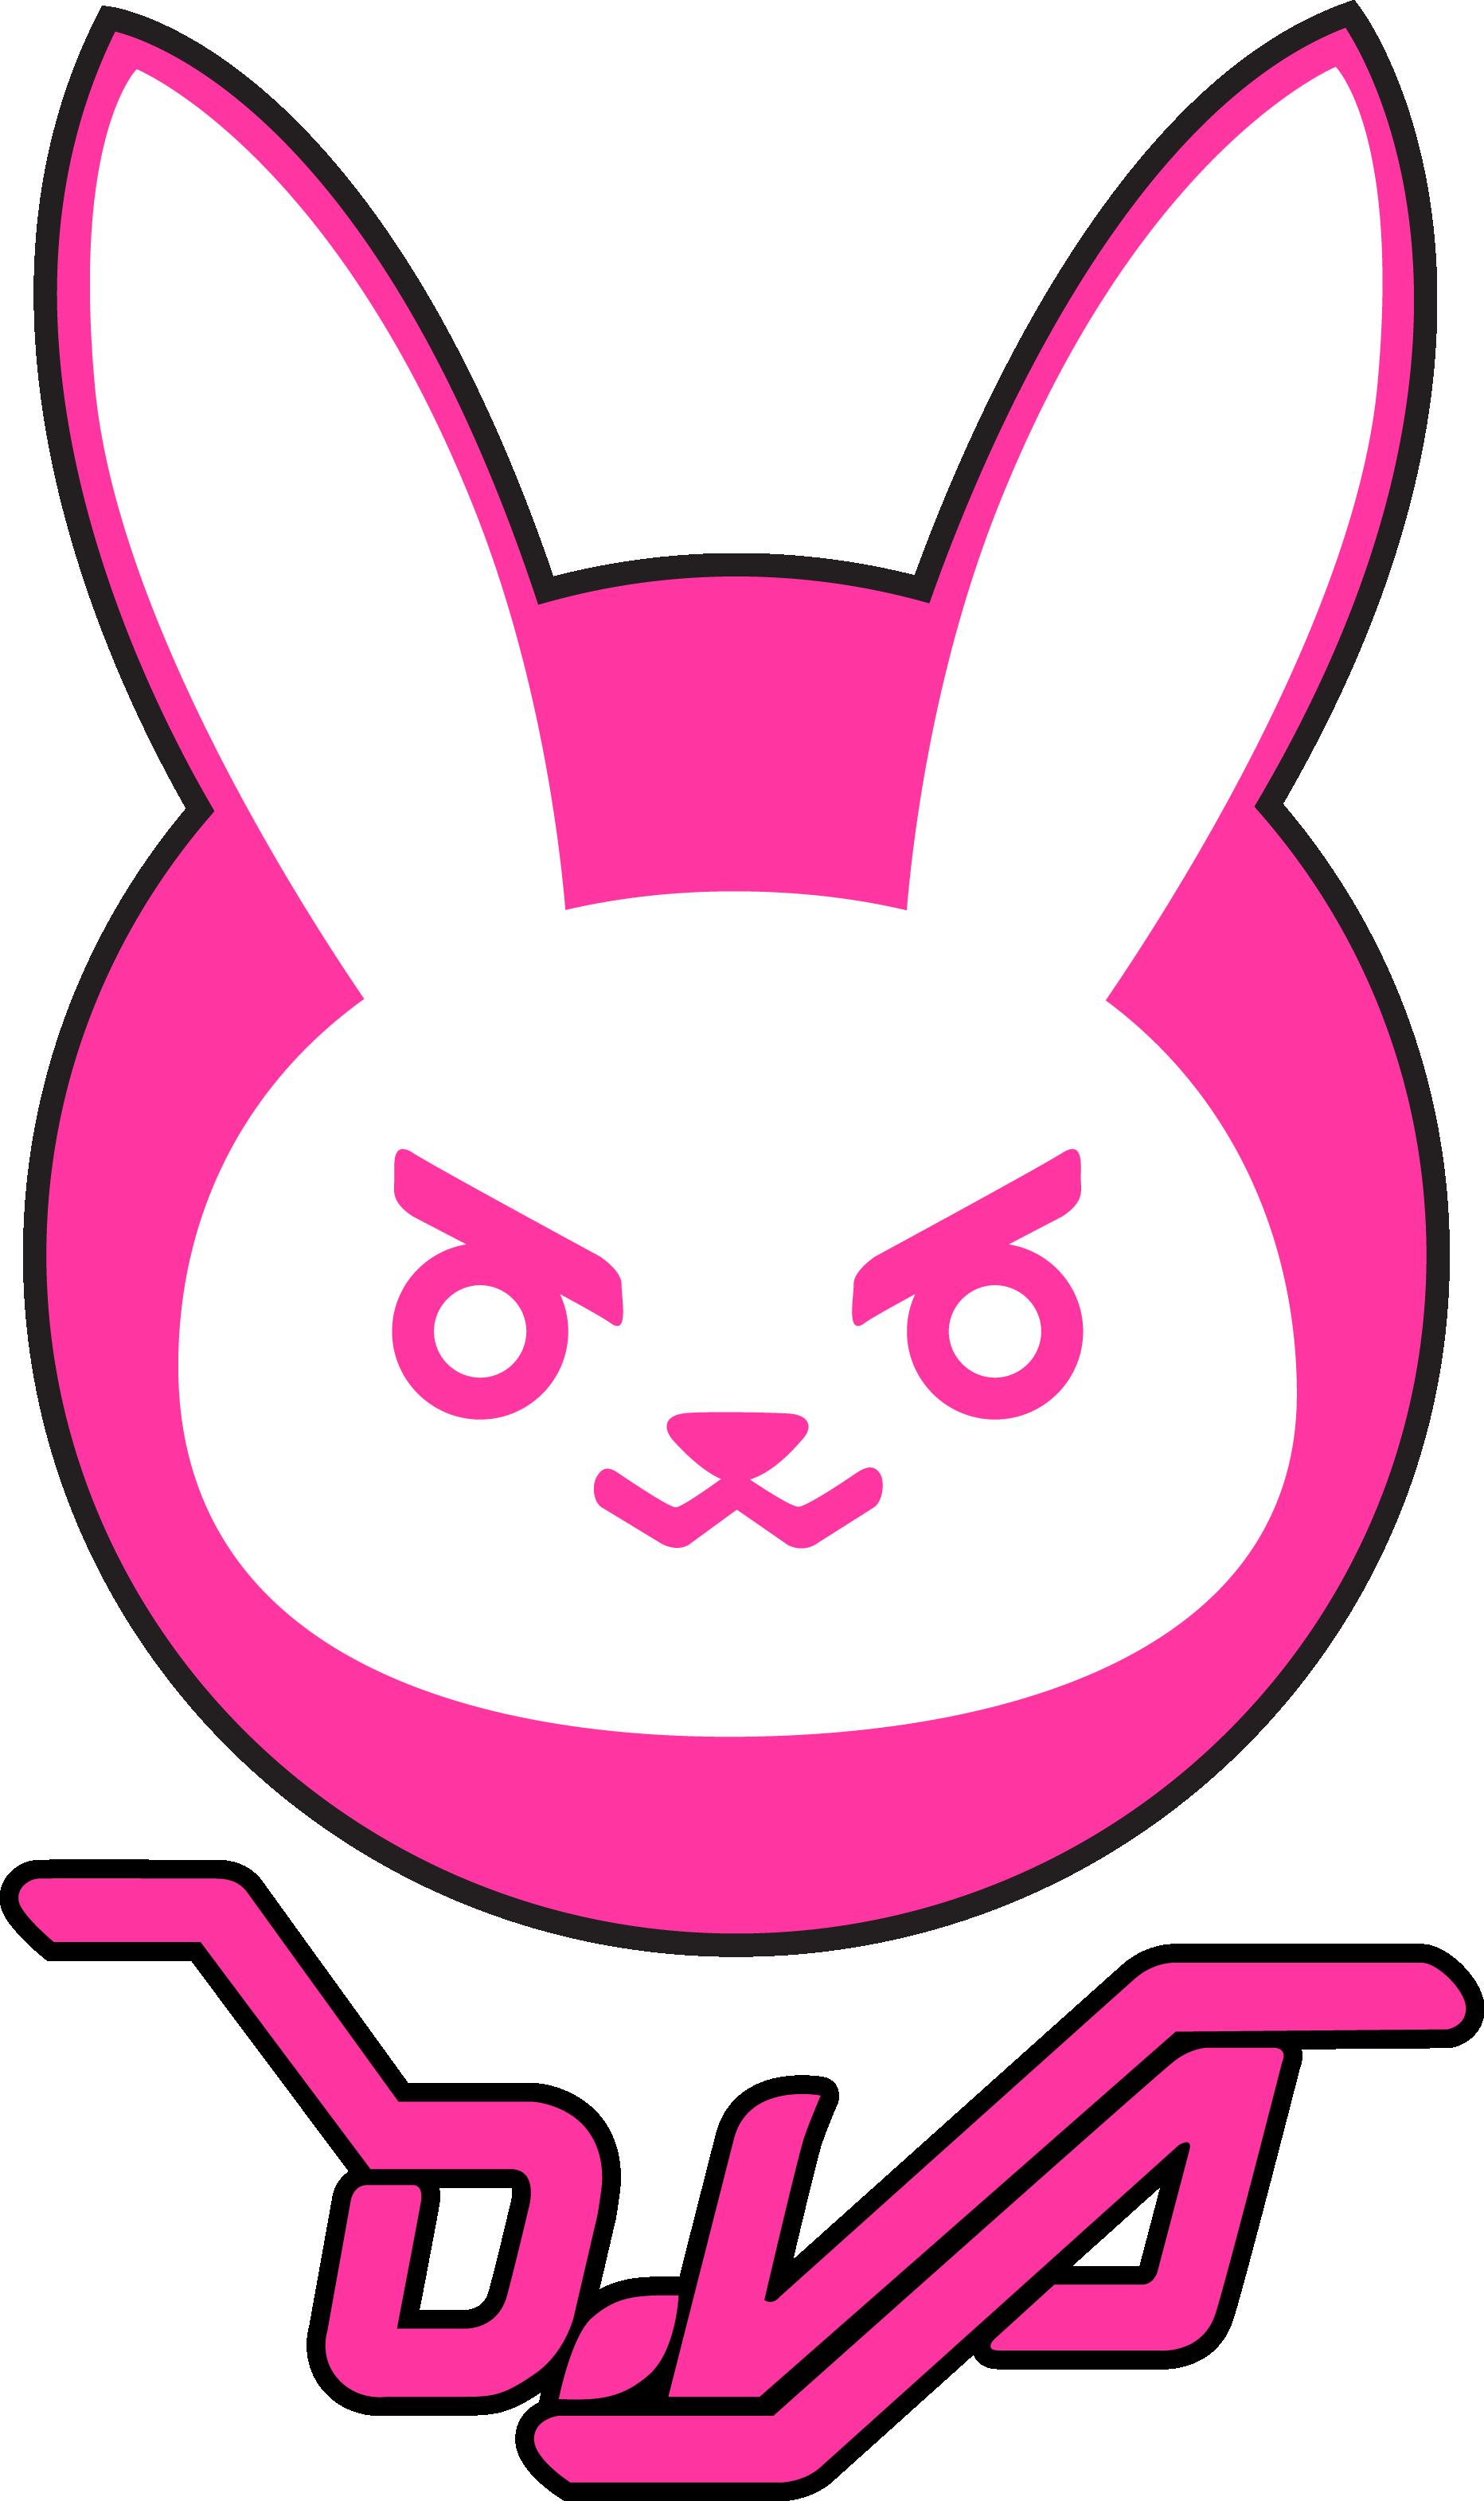 Oreo clipart emblem. D va boot animation